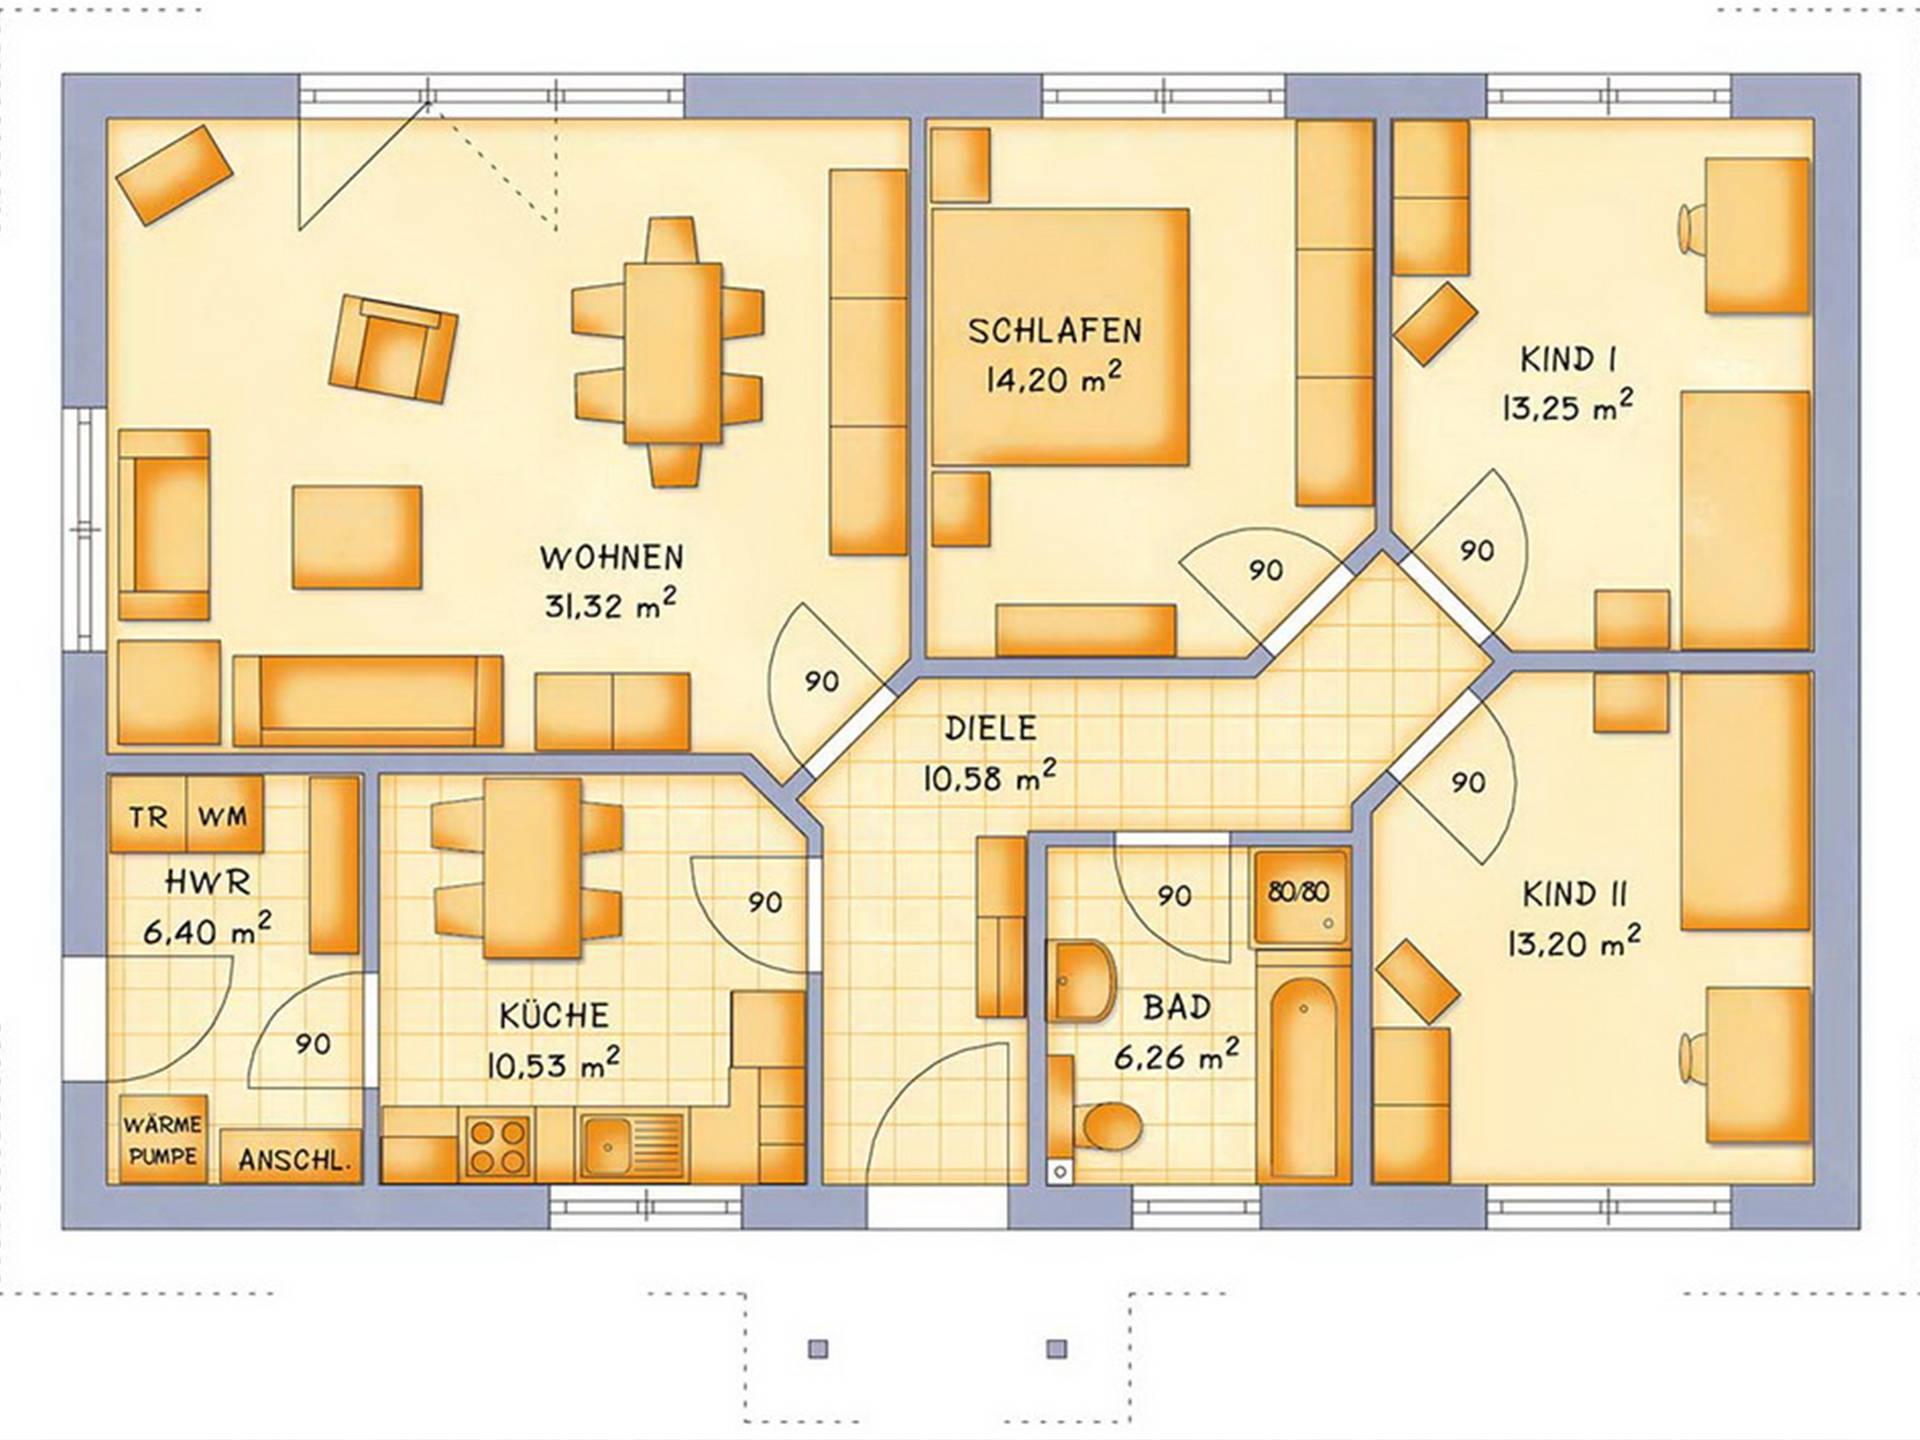 Bungalow VarioClassic 106 Grundriss - HSE Massivhaus